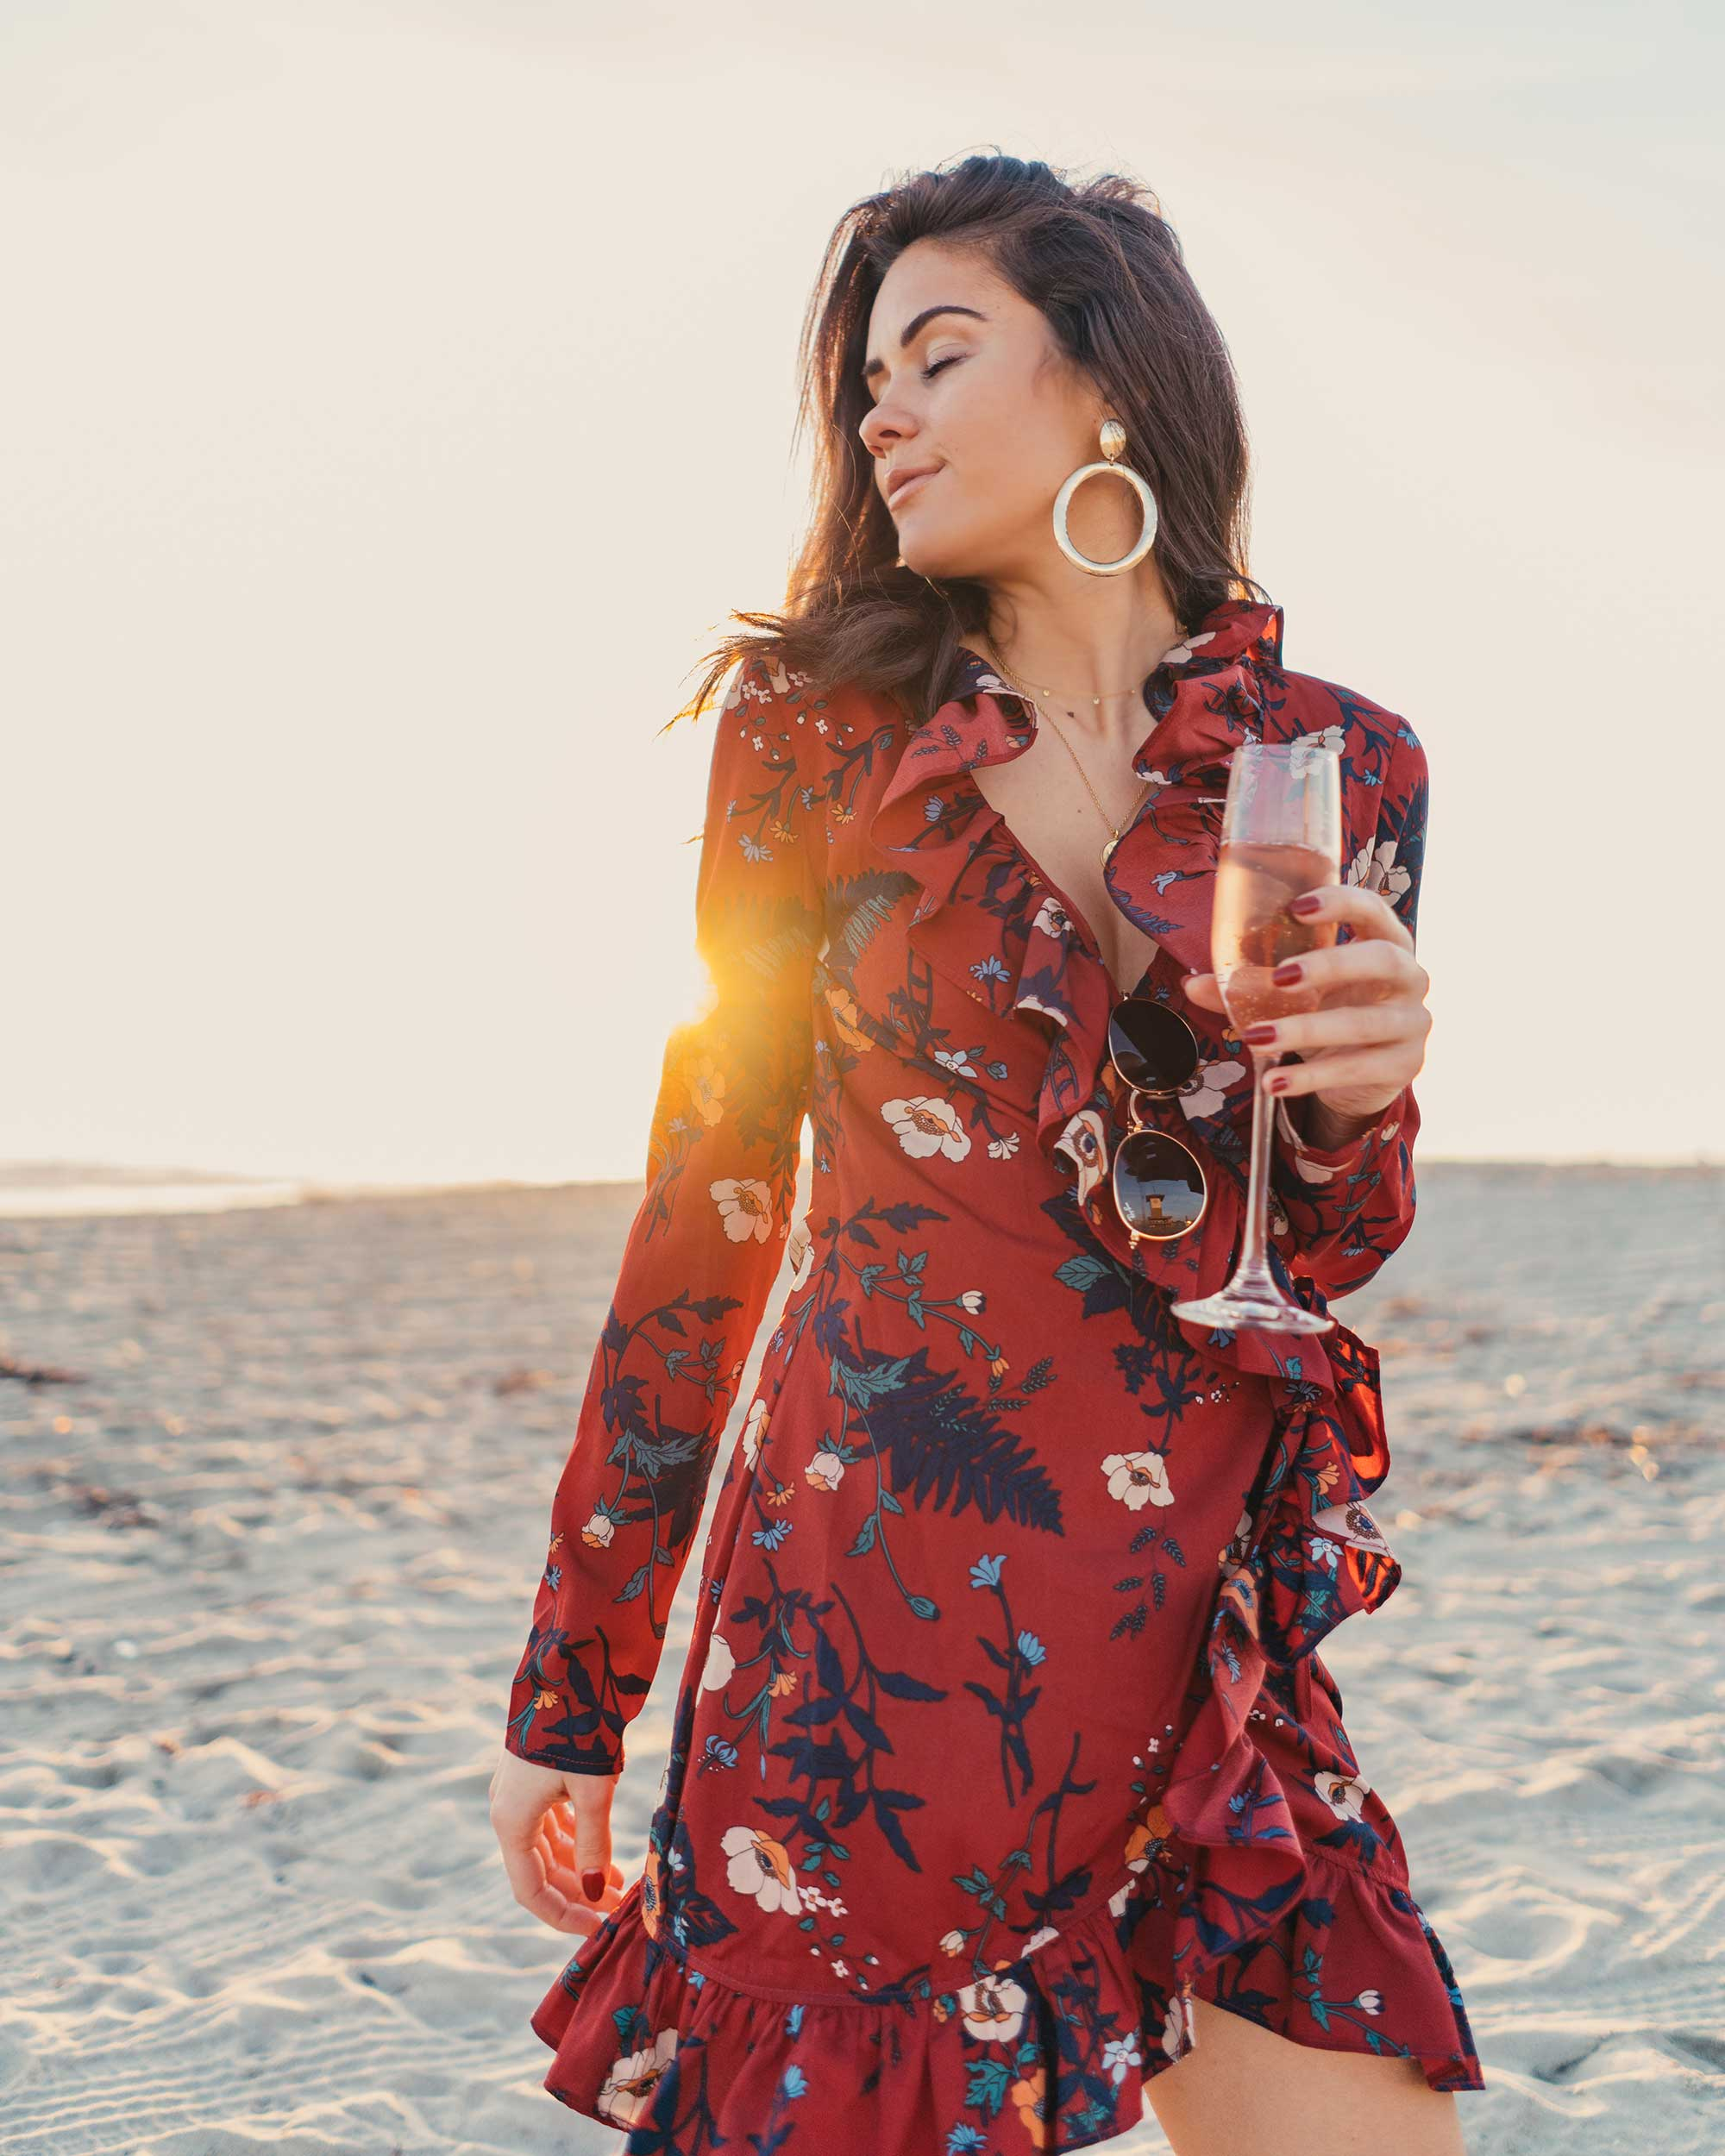 BURGUNDY-FLORAL-FRILL-WRAP-MINI-DRESS-Newport-Beach-California-Summer-Dress-5.jpg